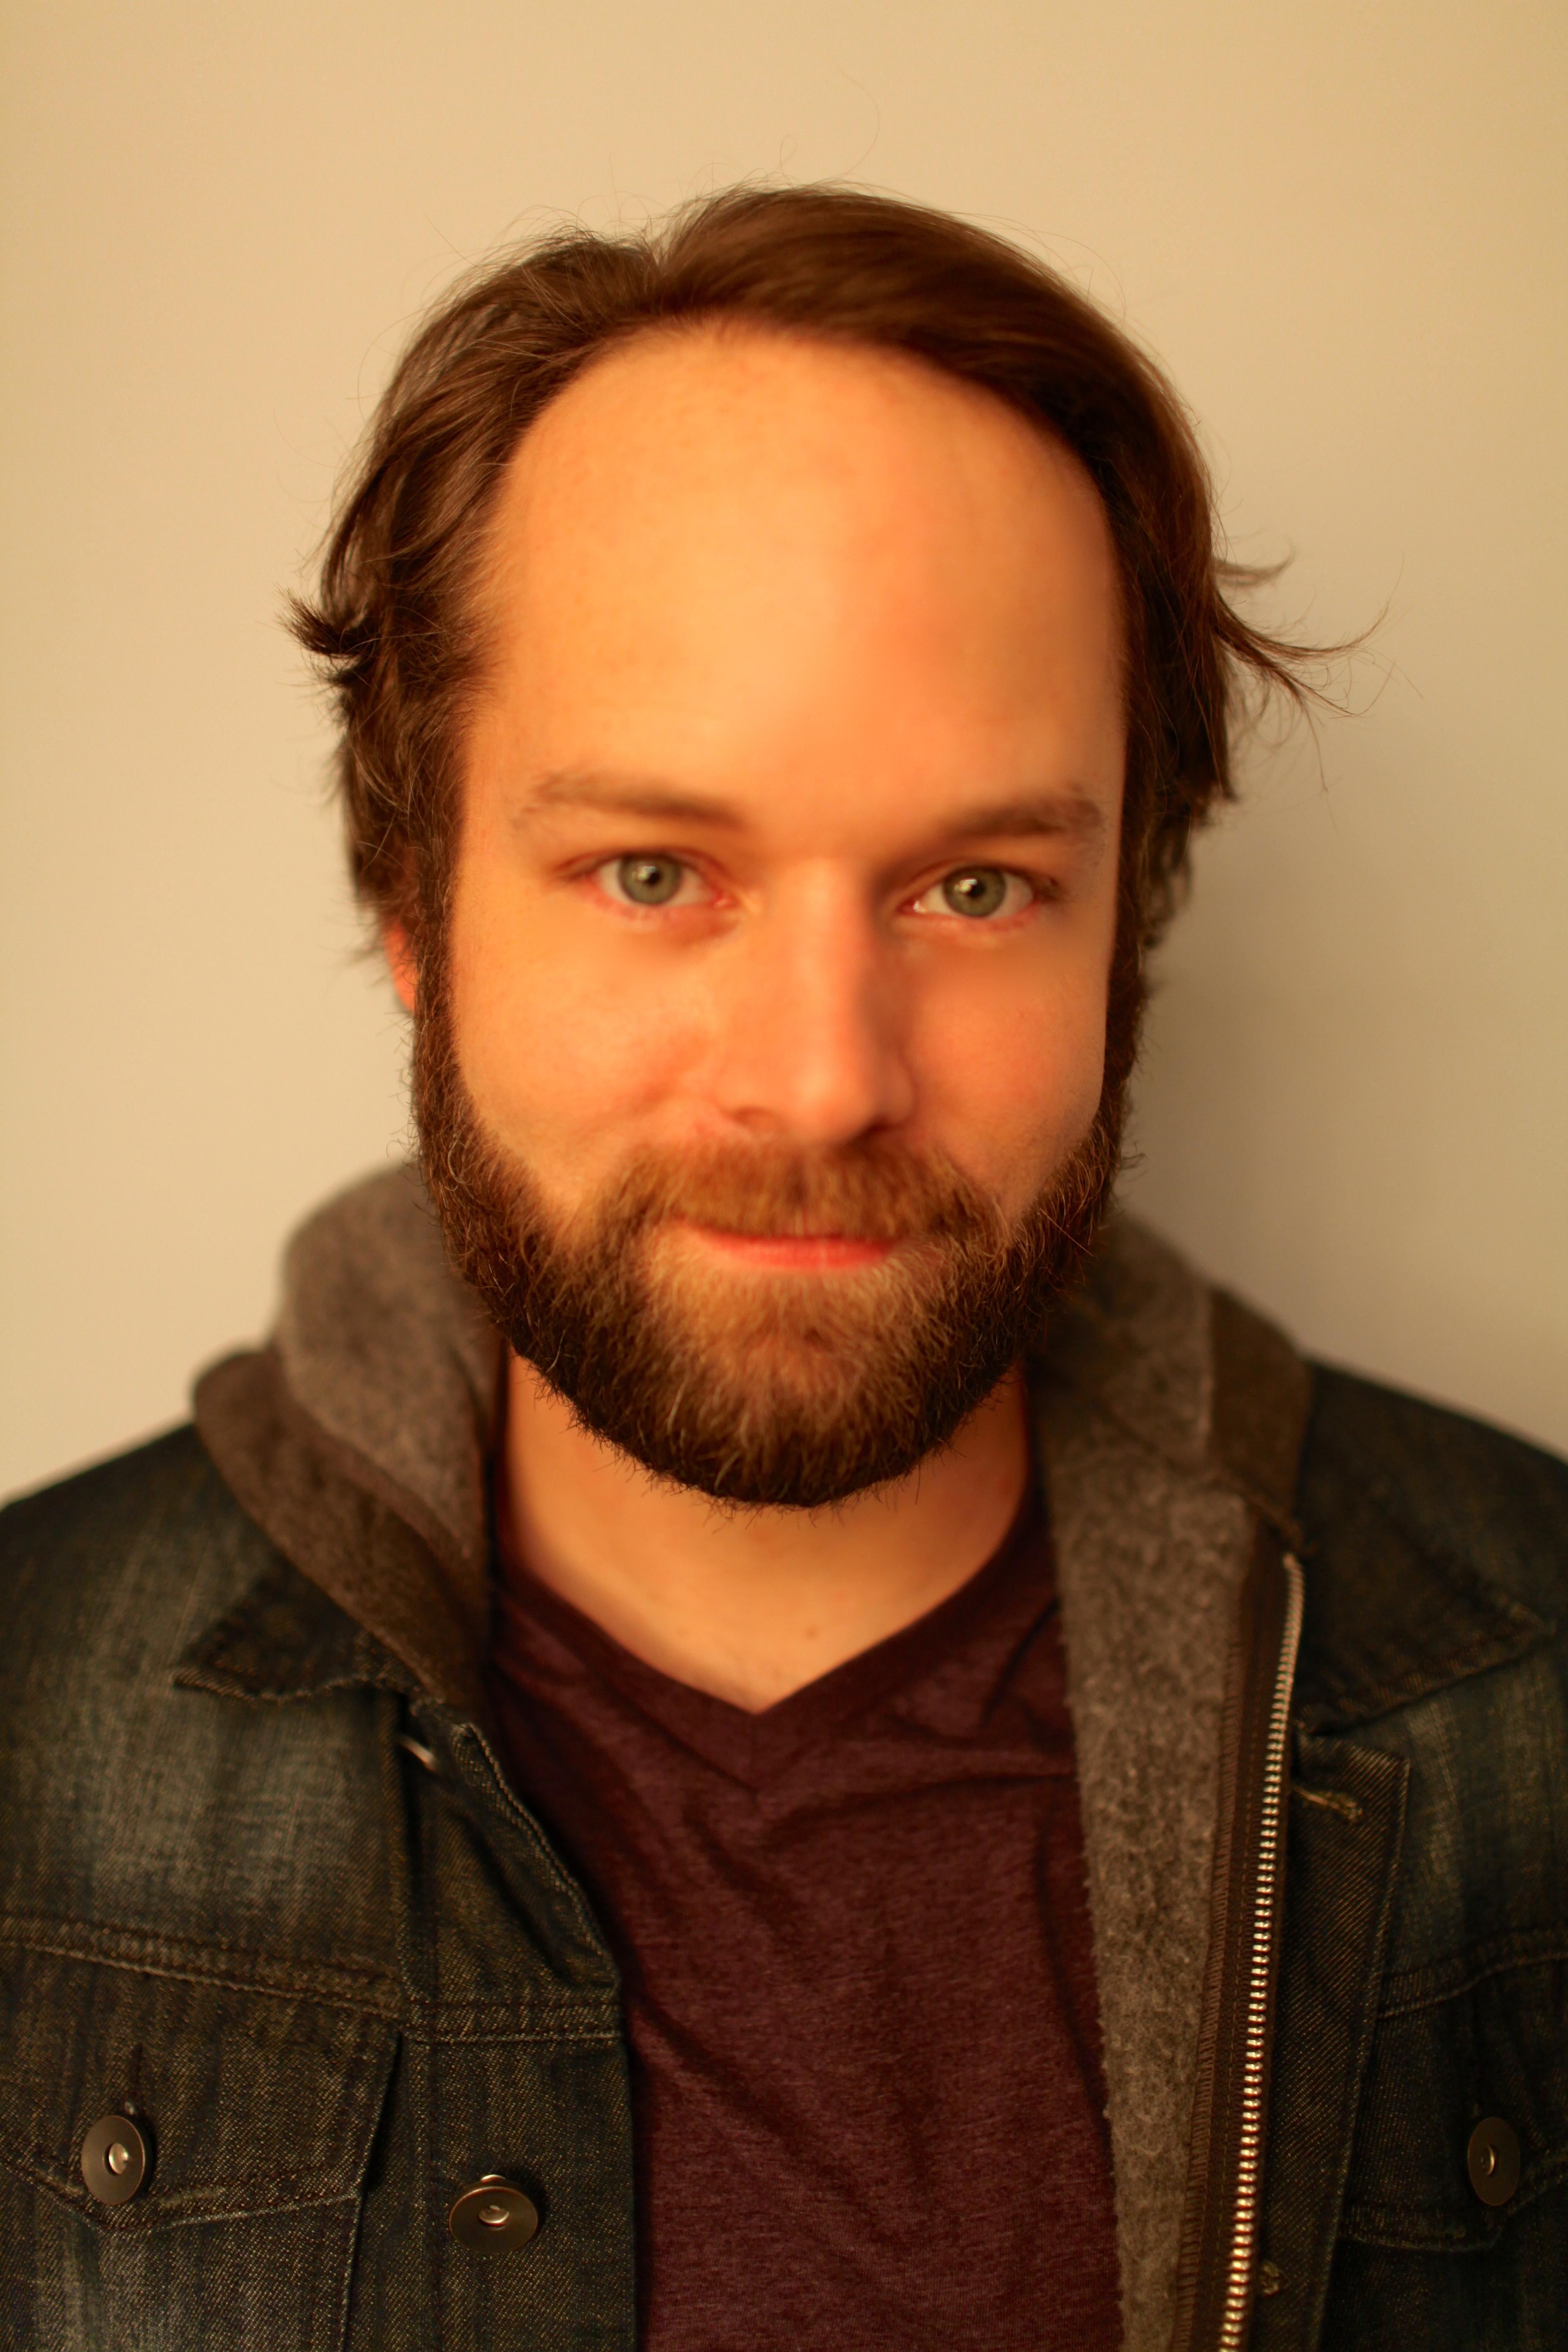 Matt Waller